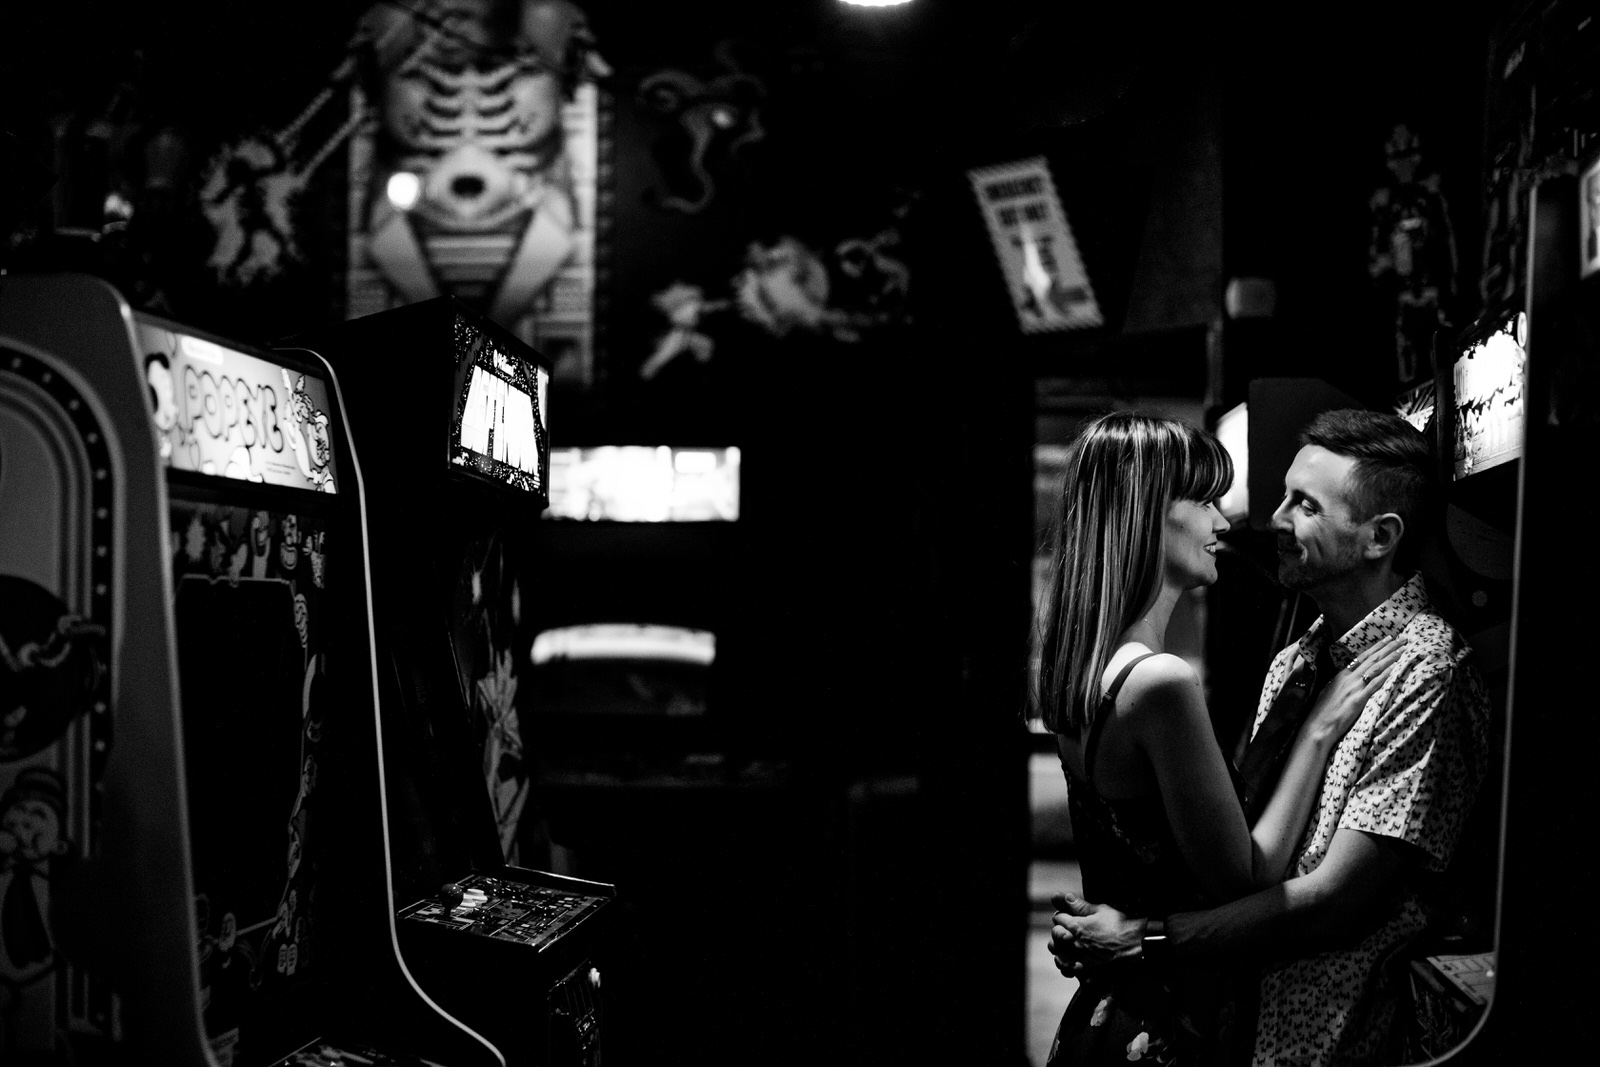 Arcade-Engagement-Session-Player-One-Orlando-Tiny-House-Photo-12.jpg